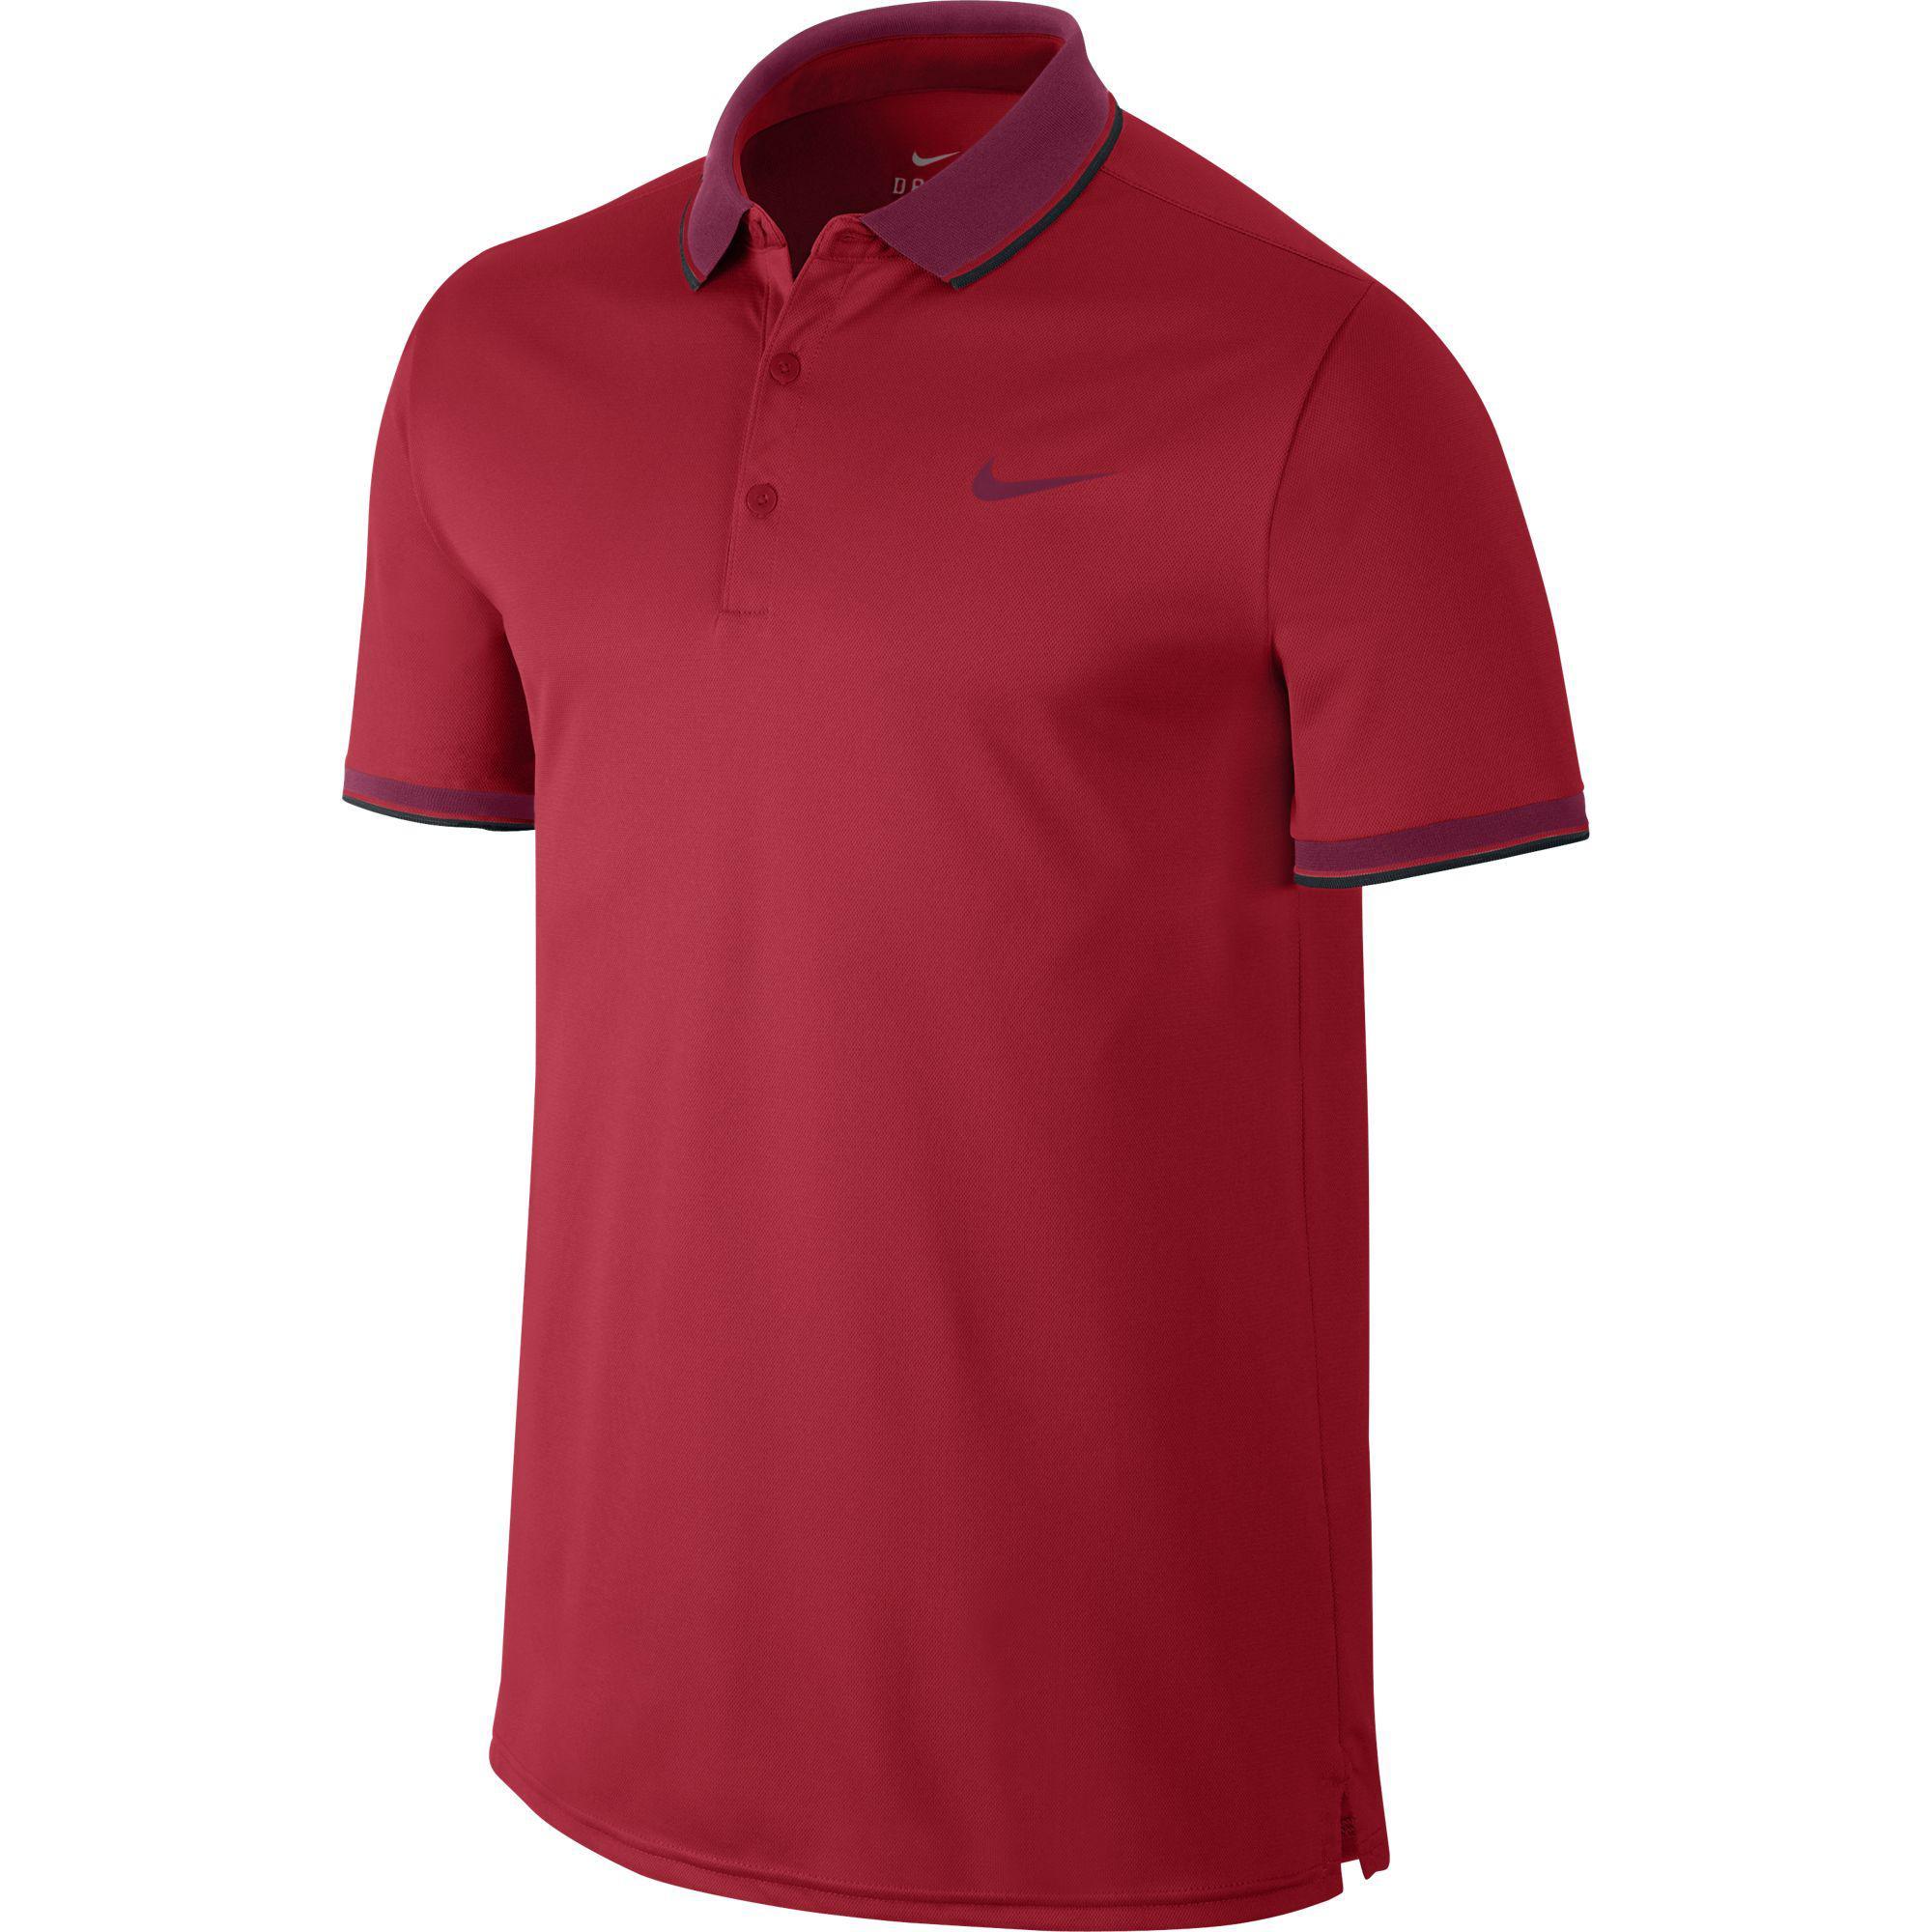 7a15f9f59 Nike Mens Court Tennis Polo - University Red - Tennisnuts.com